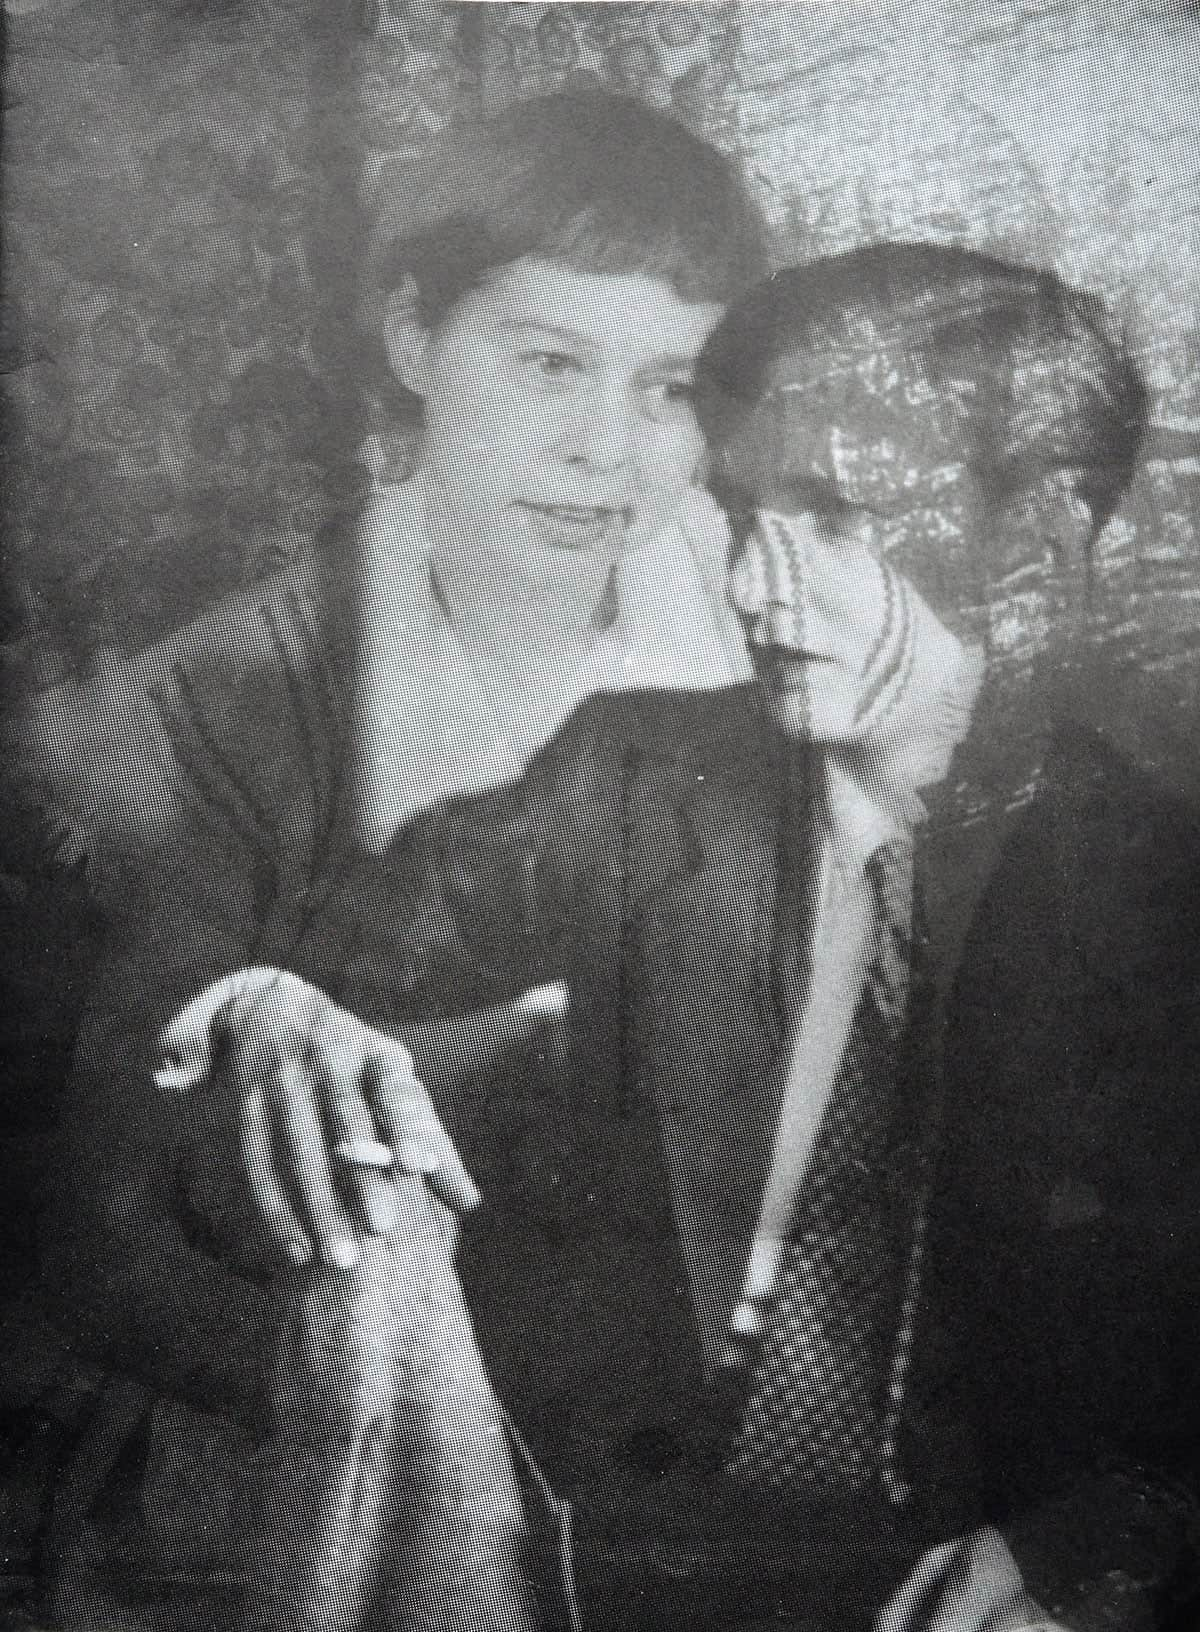 Annemarie Schwarzenbach Y Carson McCullers, Hay una lesbiana en mi sopa